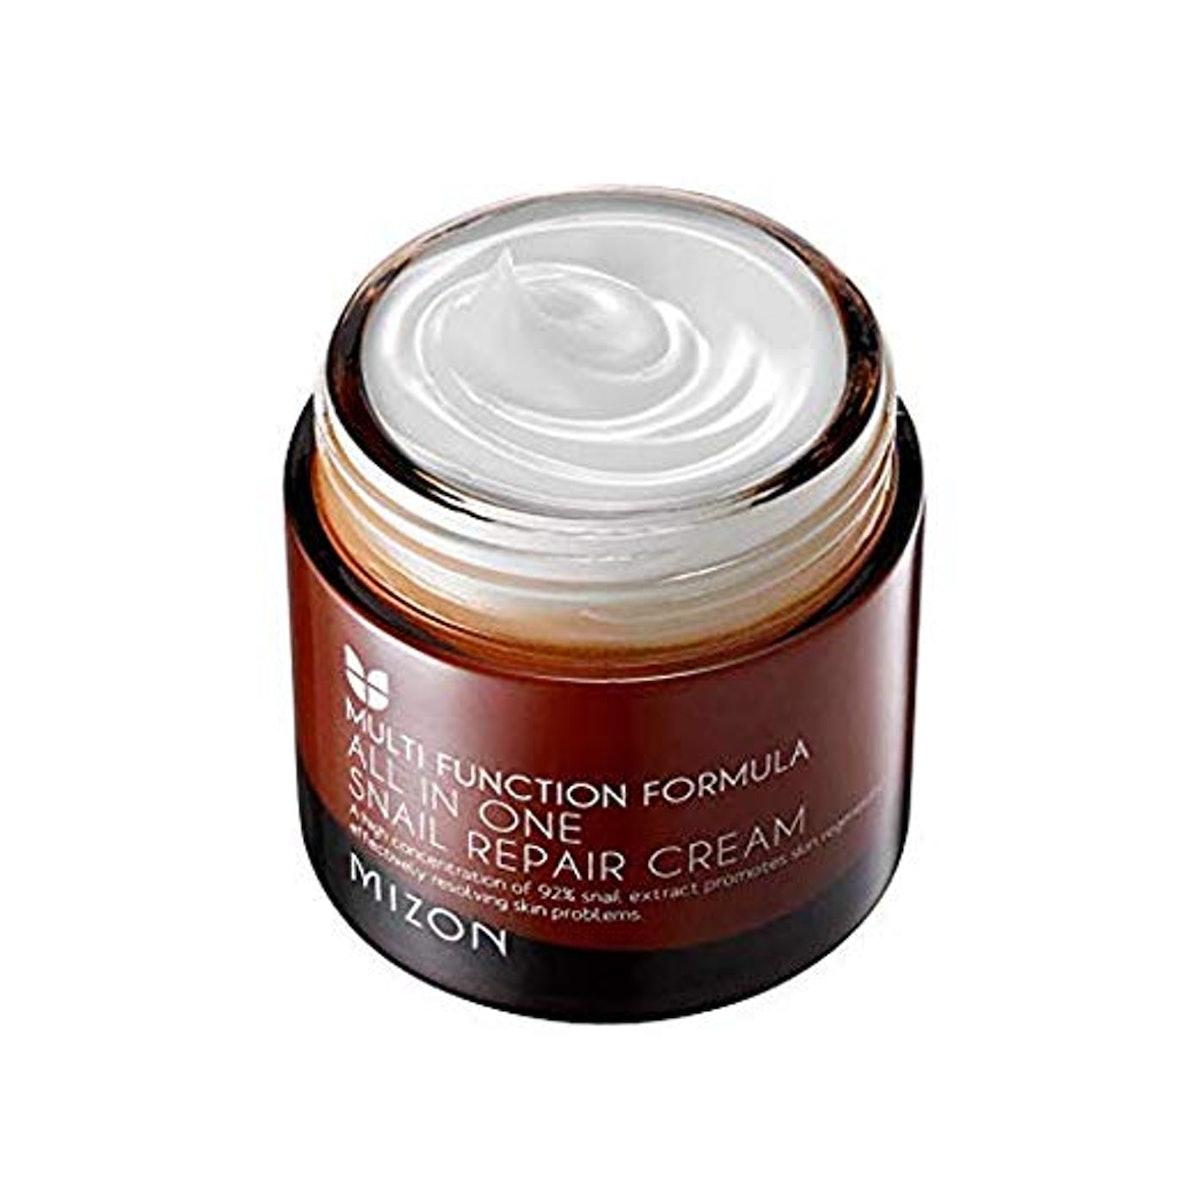 Mizon All In One Snail Repair Cream